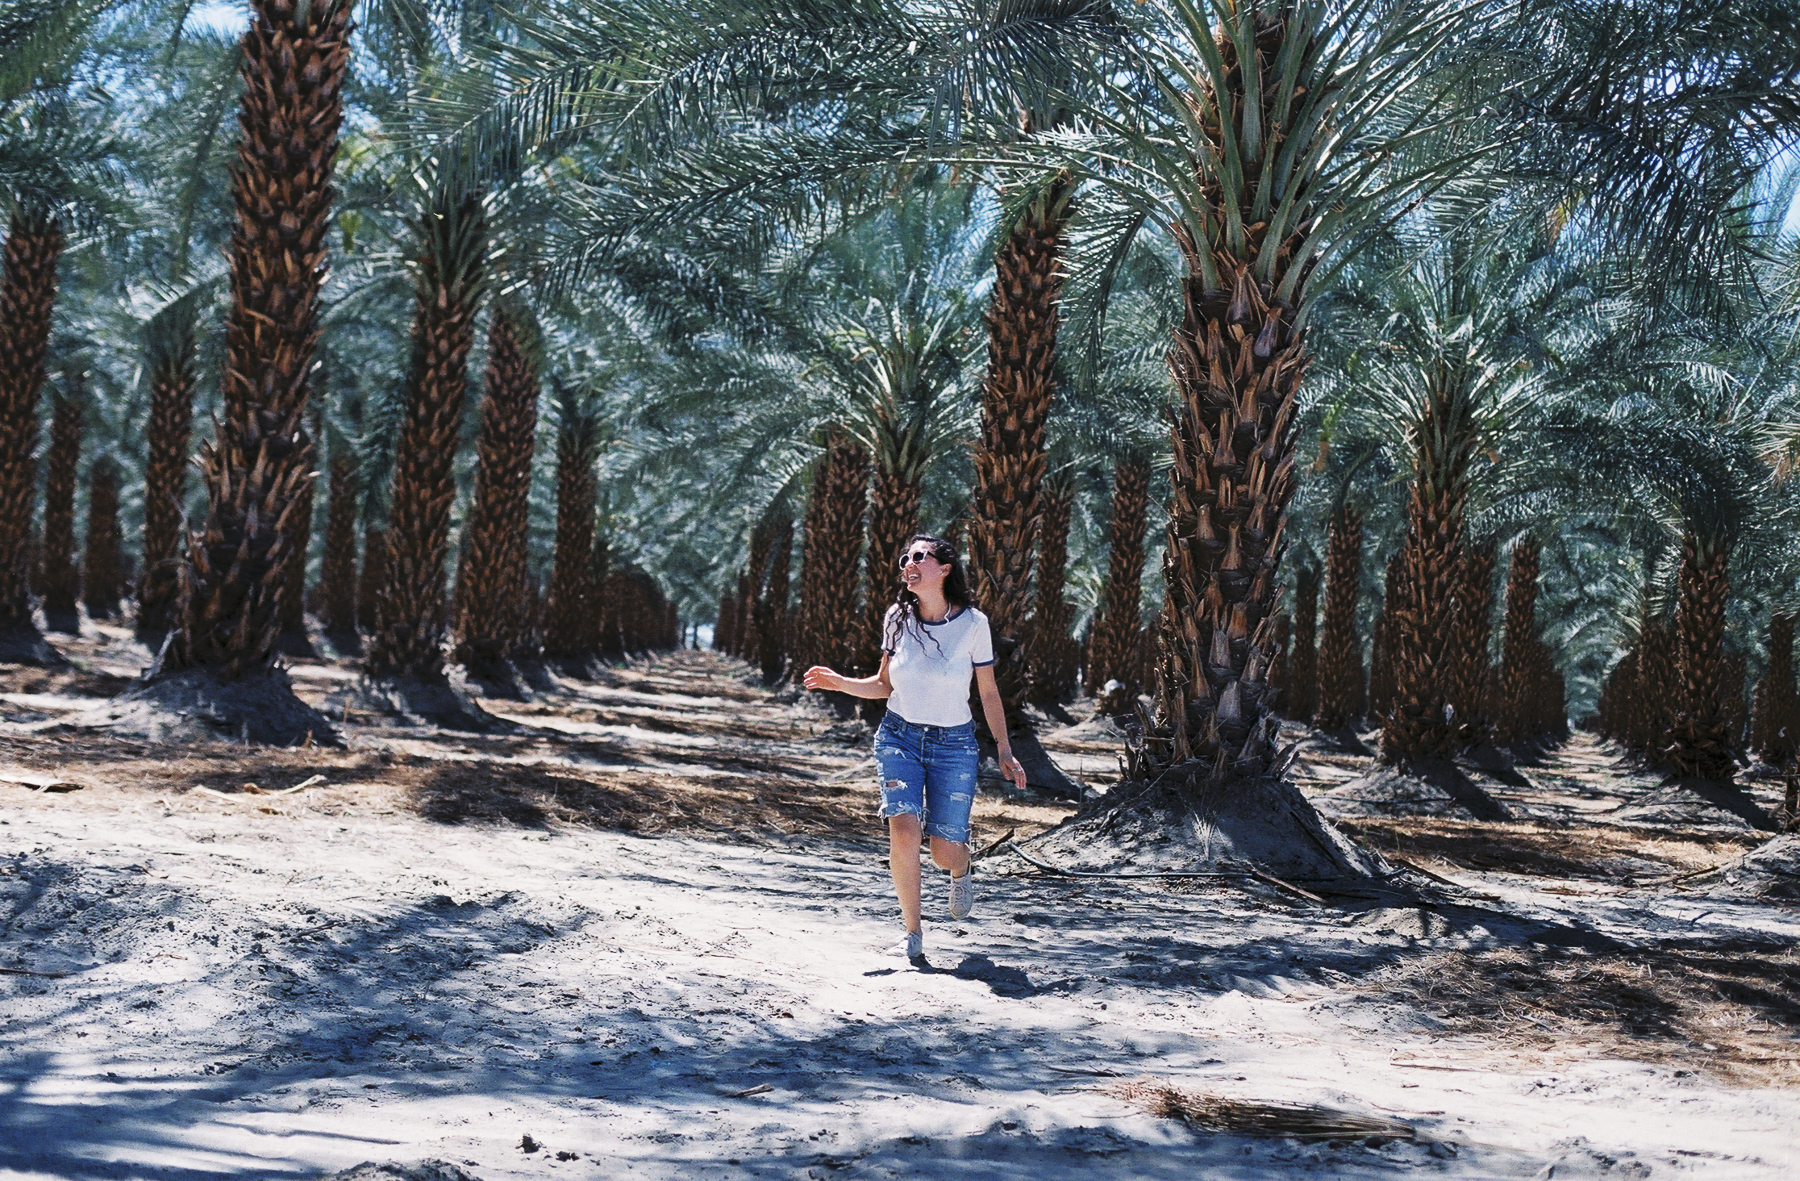 A weird palm tree farm we passed.